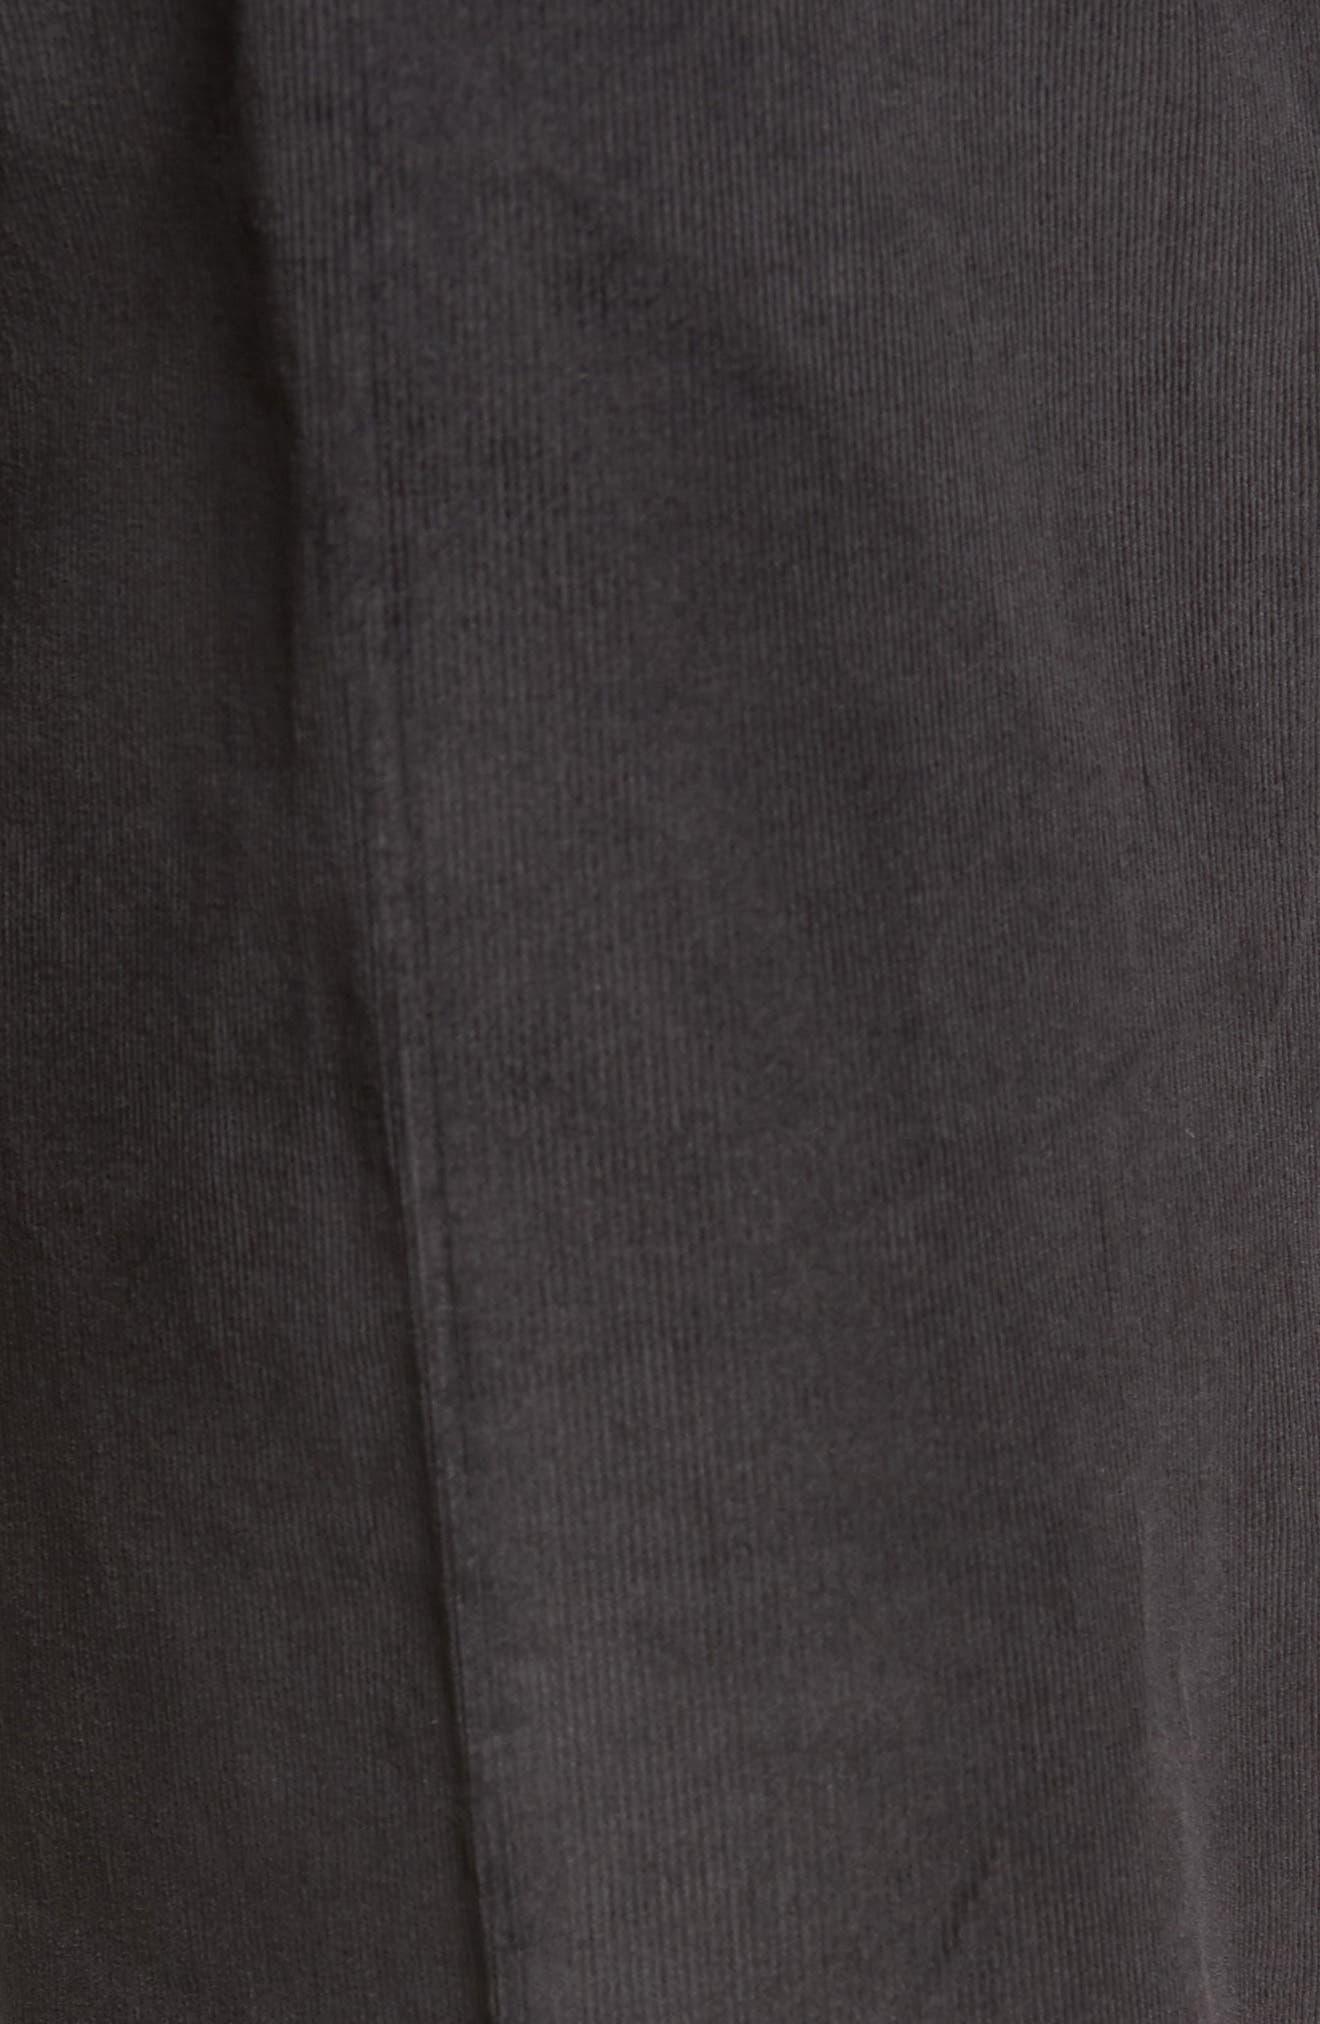 Corduroy Pants,                             Alternate thumbnail 5, color,                             020